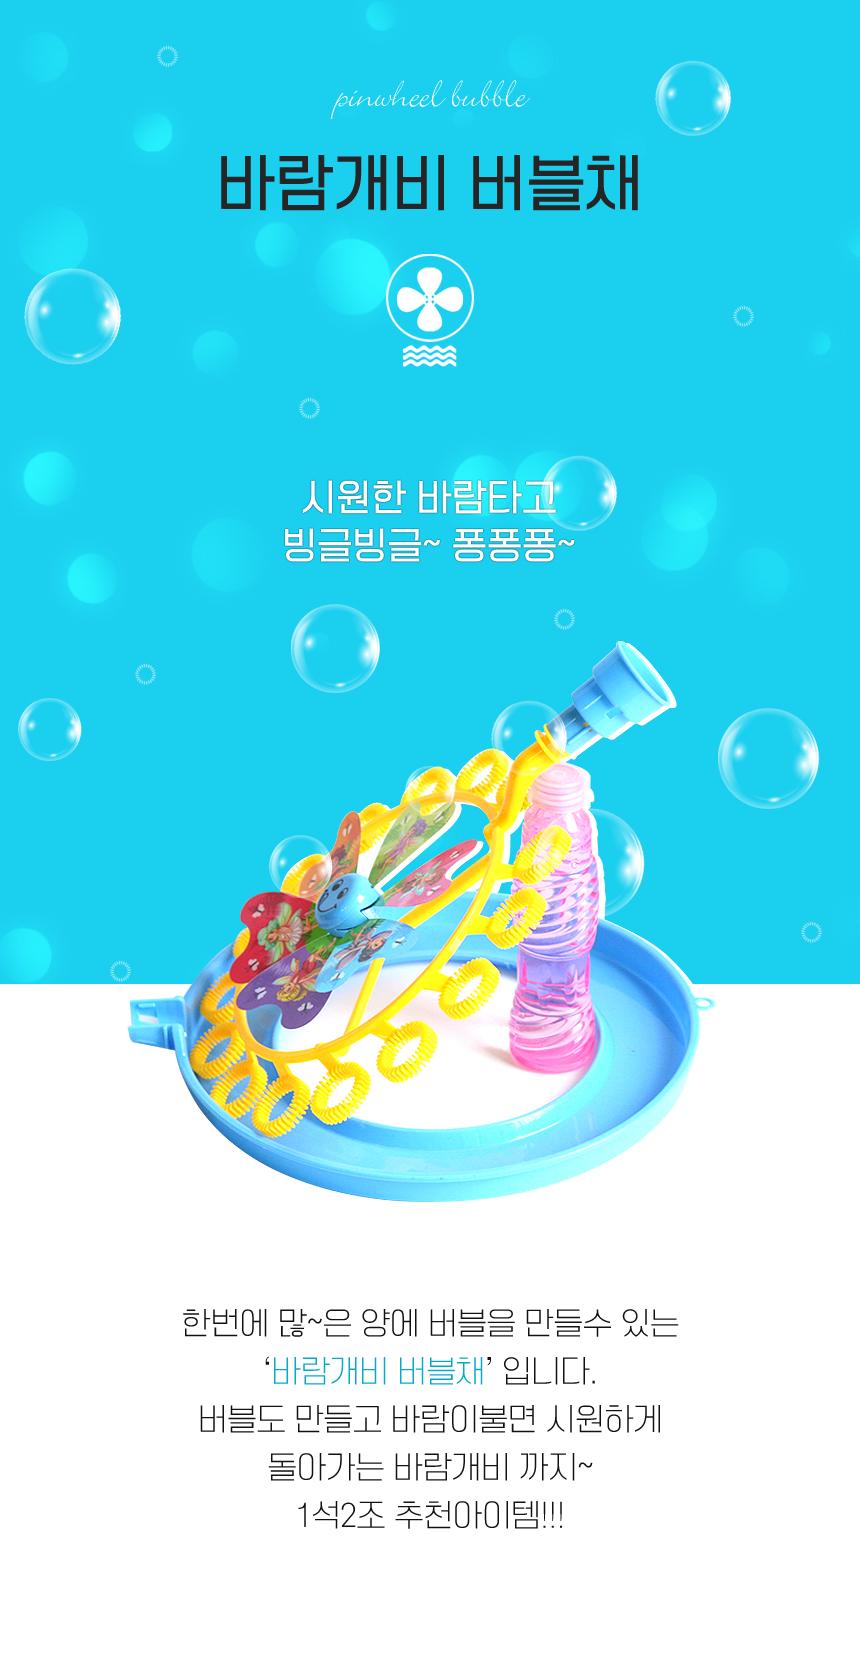 pinwheel_bubble_01.jpg